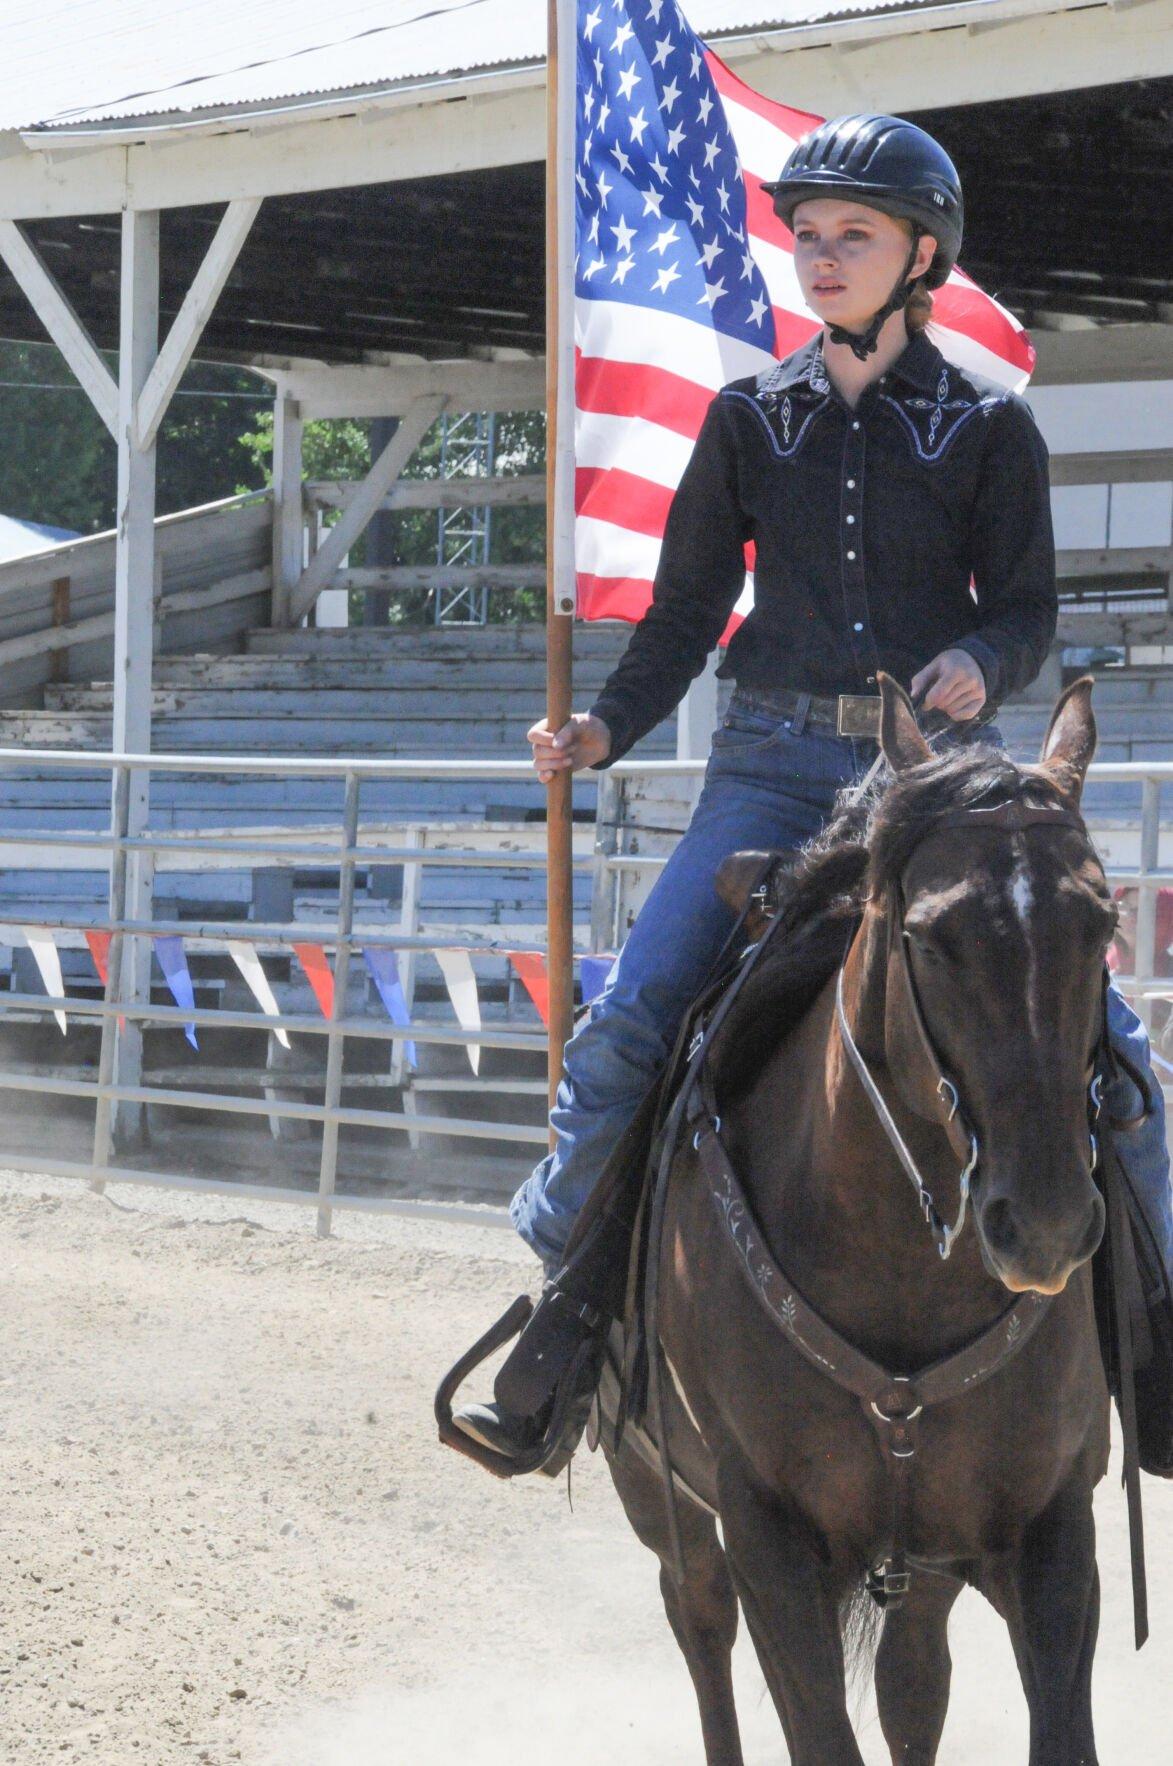 Horse show rider photo